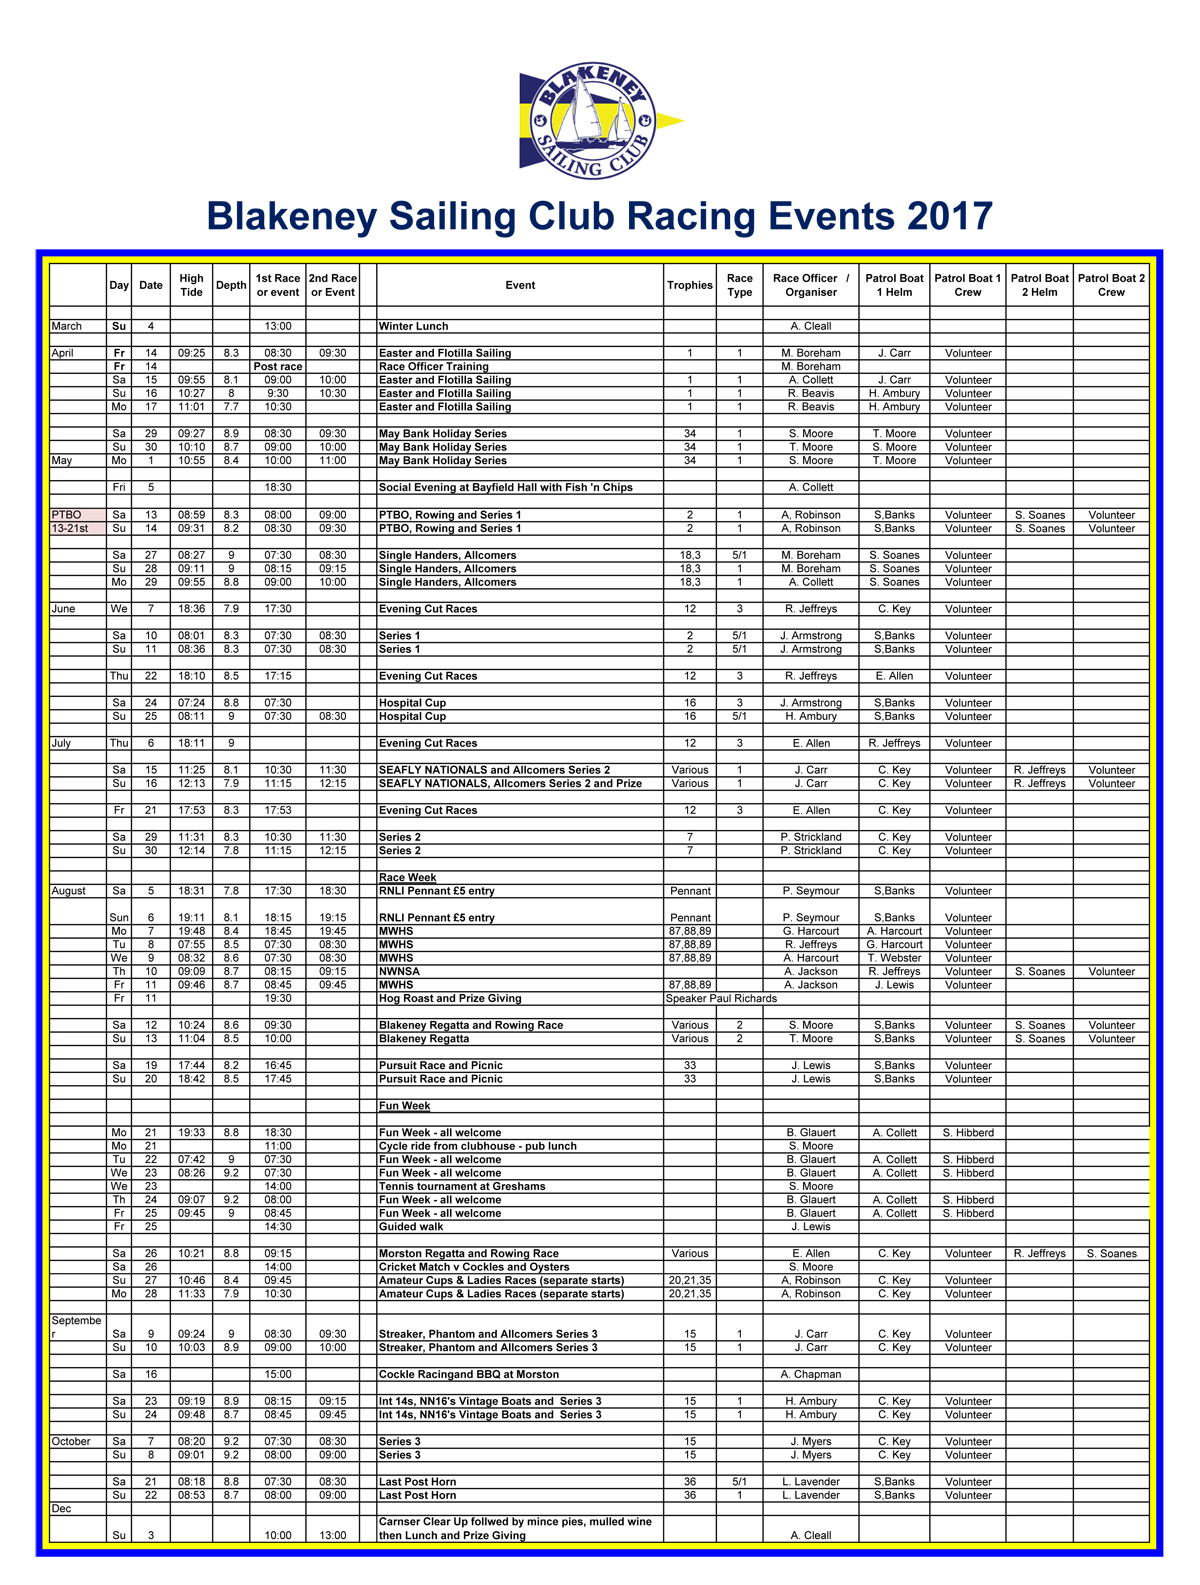 Blakeney Sailing Club Race Events 2017